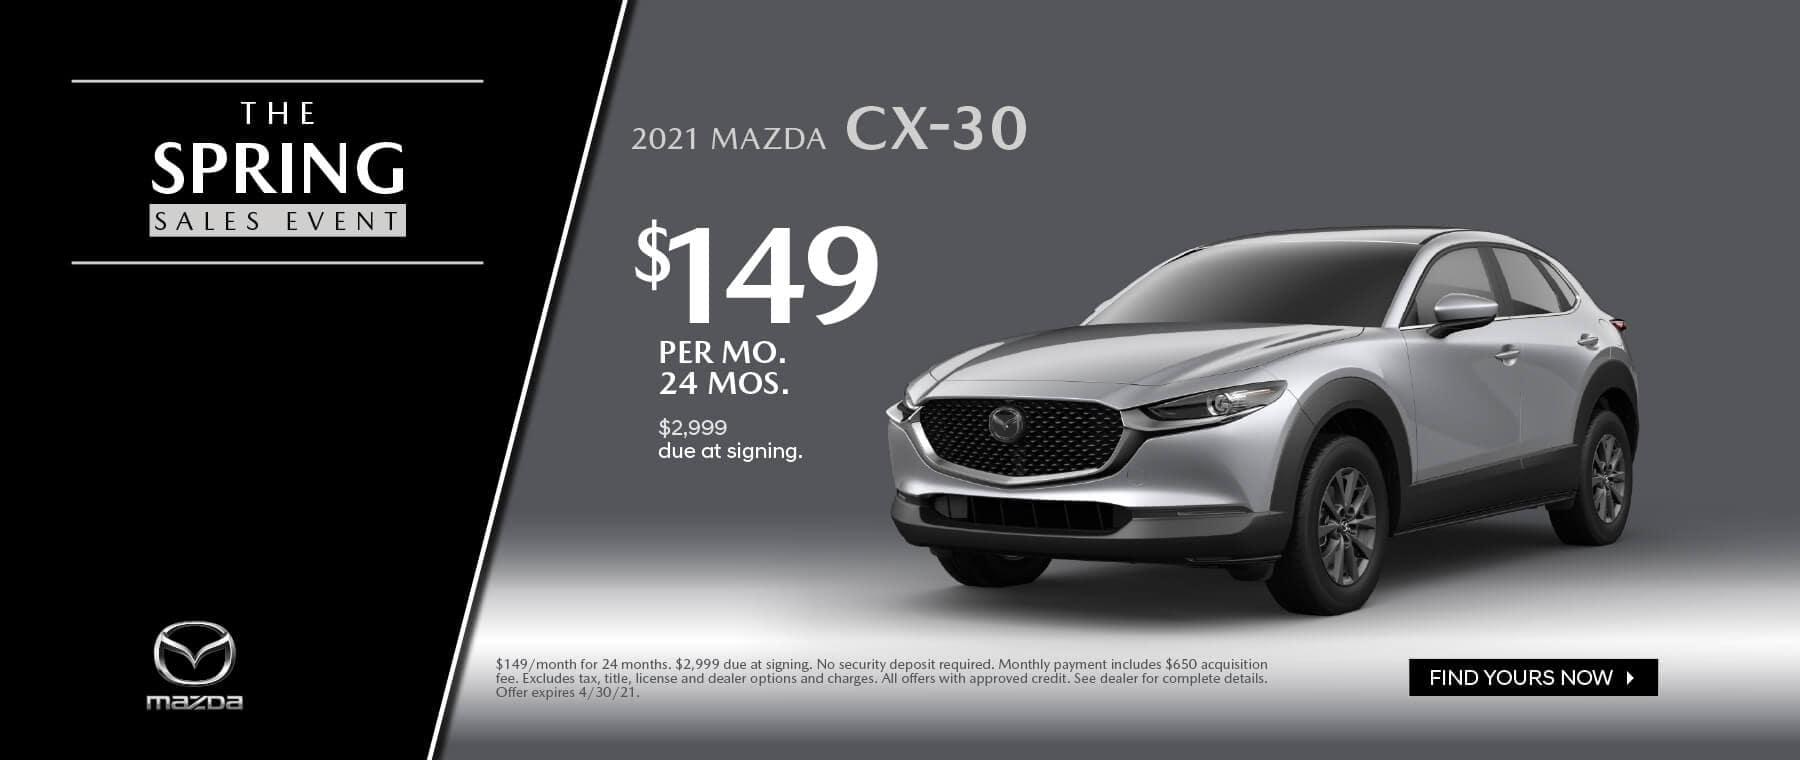 2021.04.15-Keffer-Mazda-APR-Web-Banner-Offer-Update-S51838vw-6